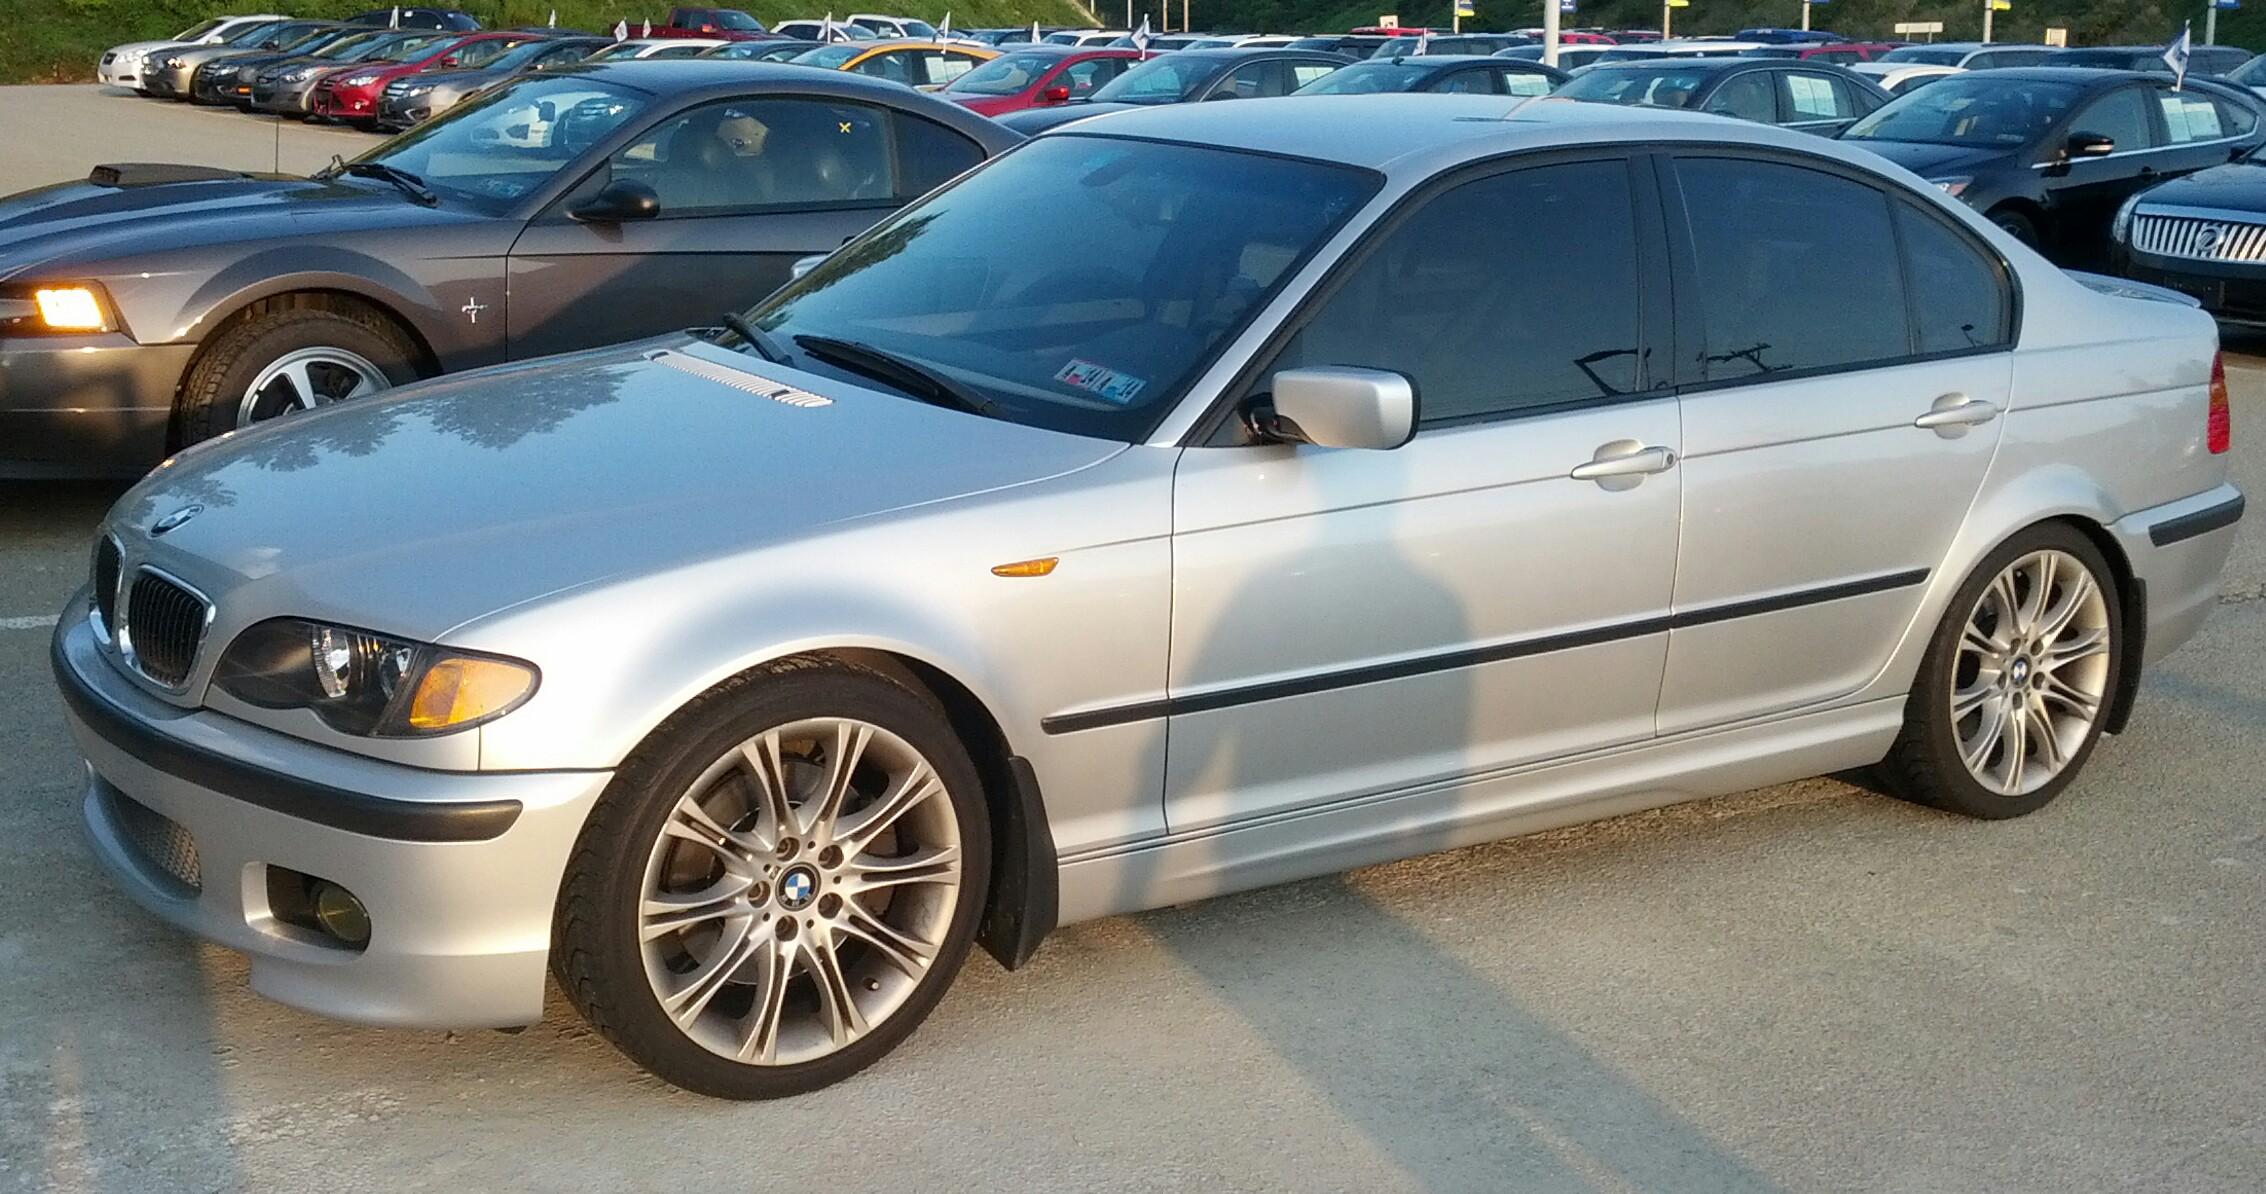 BMW E46 330 ZHP For Sale Forum | 330i/Ci BMW ZHP Performance Package